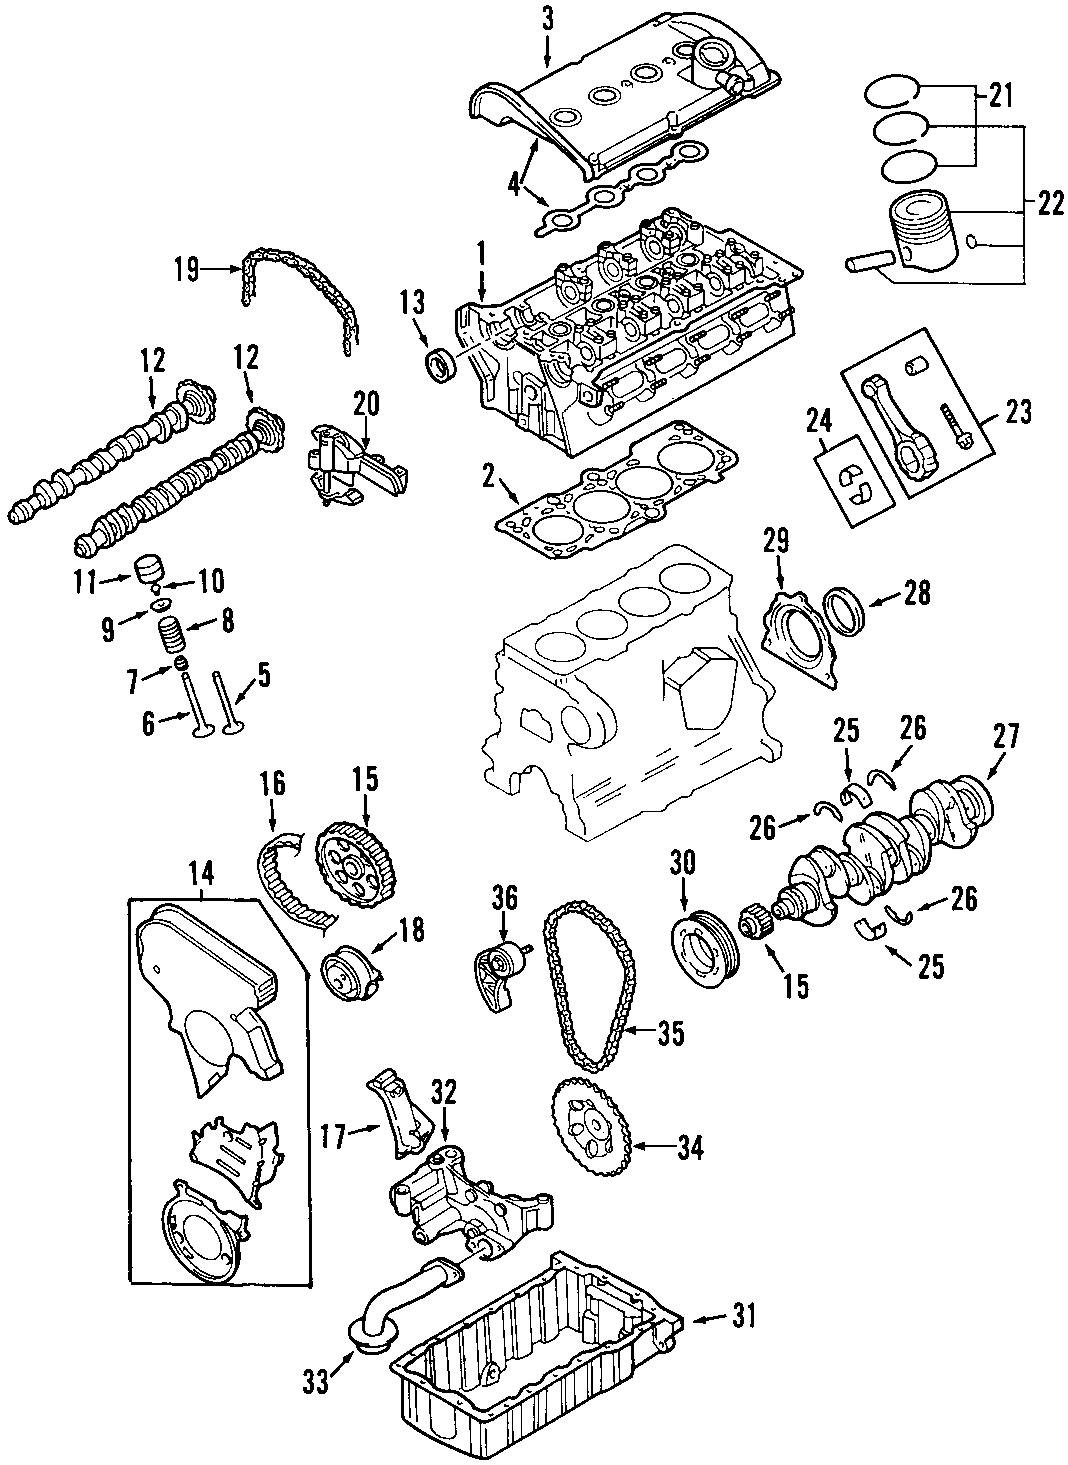 Volkswagen Beetle Engine Piston. RINGS, Pin, Incl